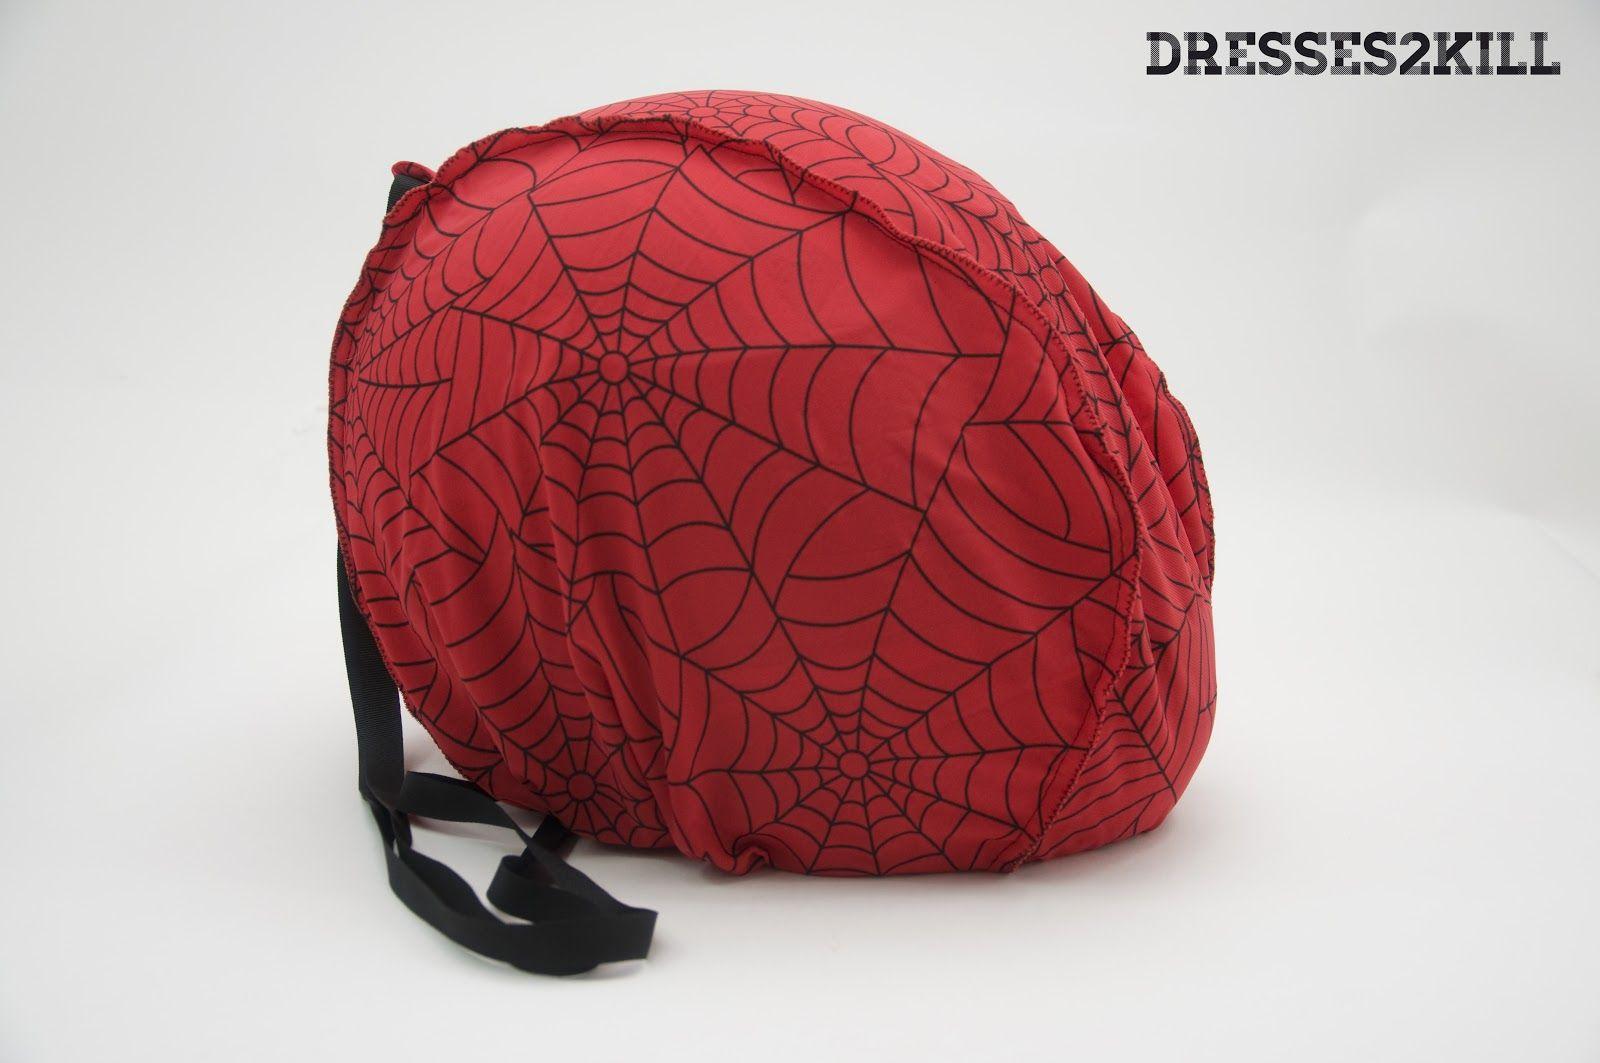 Funda Casco Spider * Spider Helmet Bag  www.dresses2kill.com  Dresses2Kill - Handmade Clothing